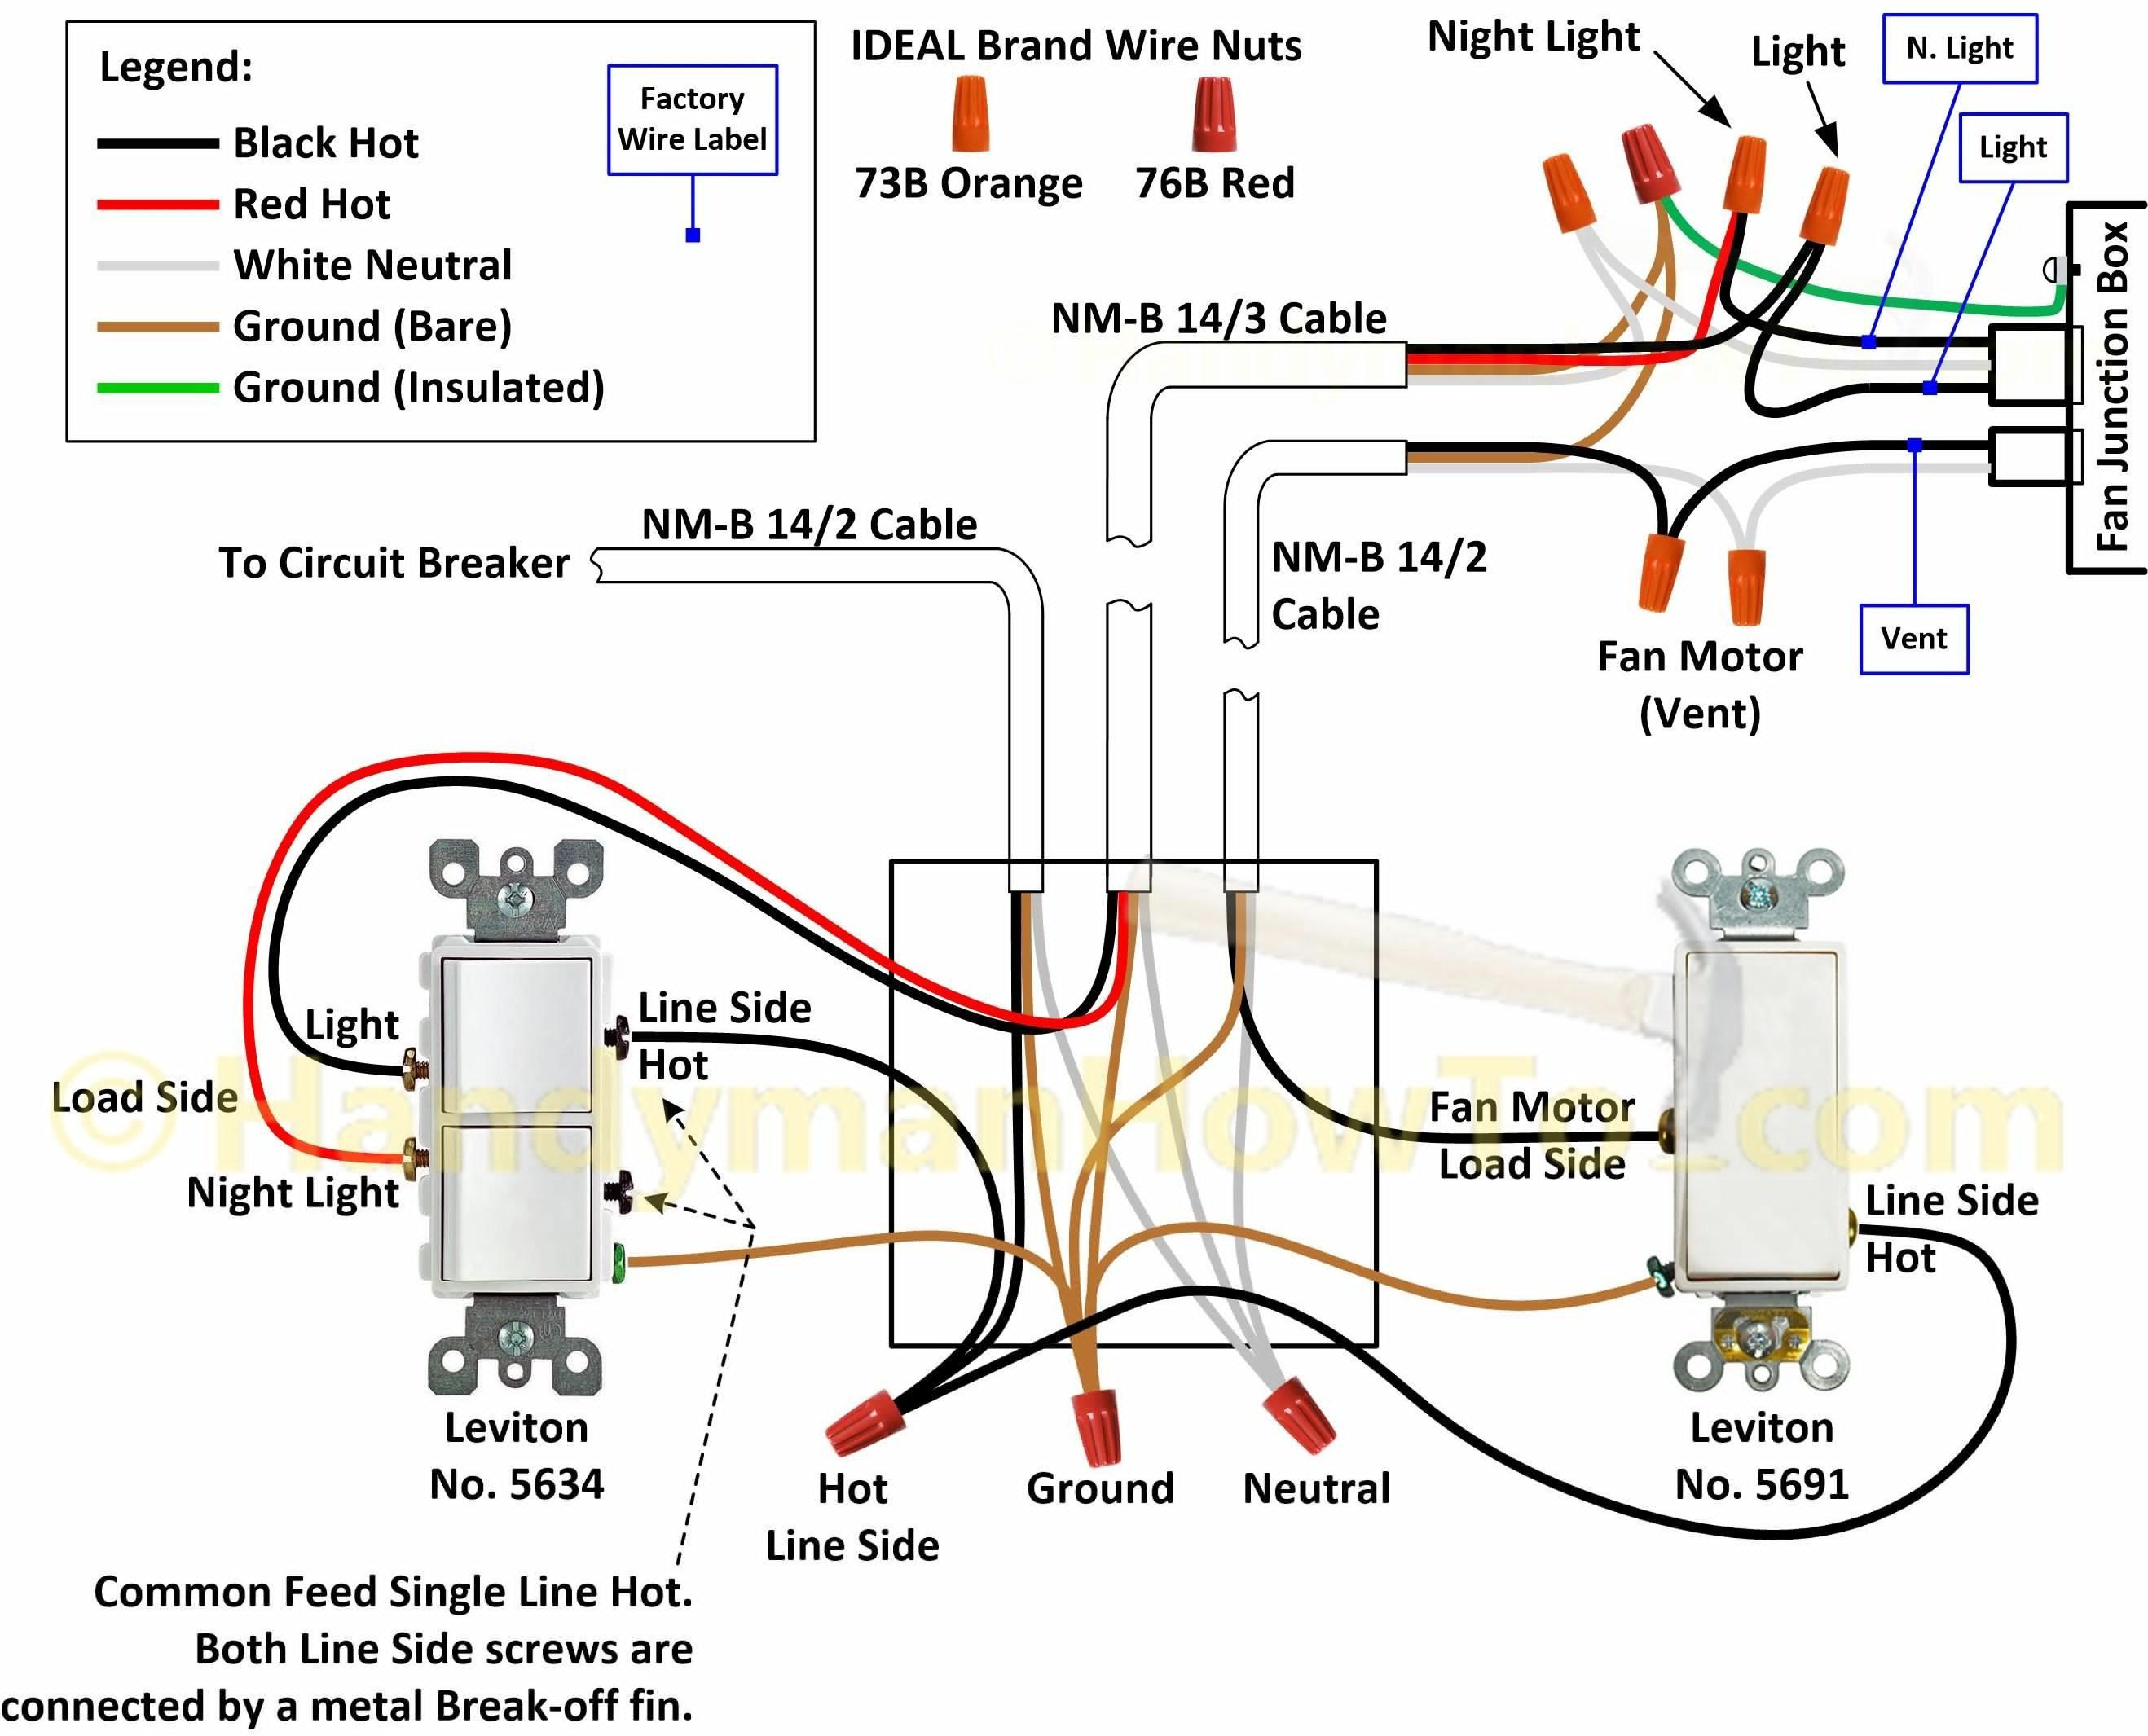 How To Wire A 3 Way Switch Diagram Elegant Fan Light Wiring Hampton Bay Ceiling 2